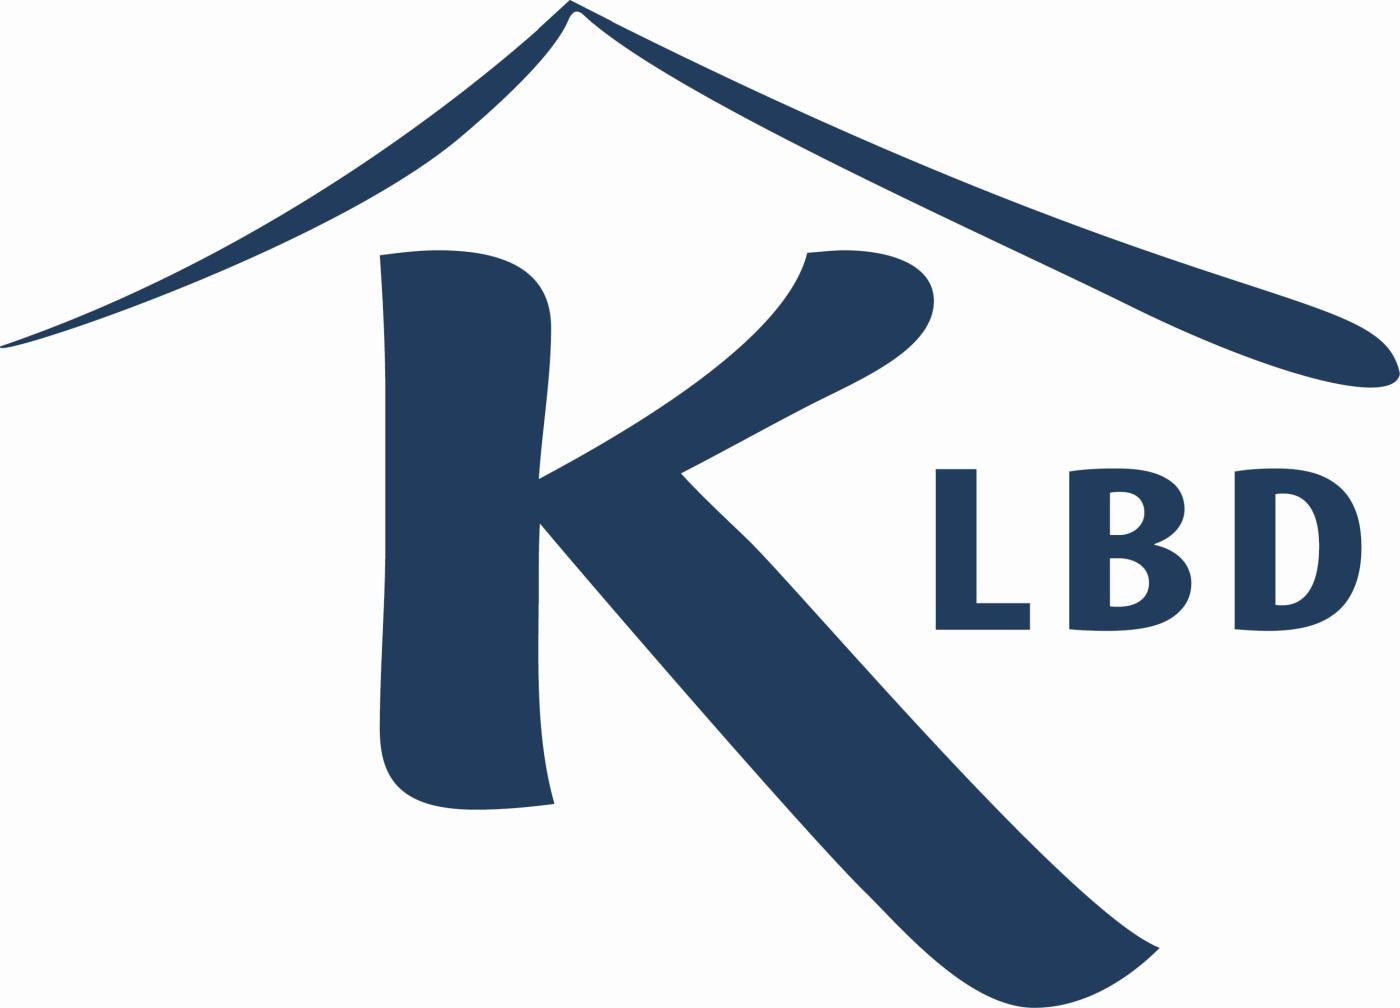 Kosher Certification Klbd Kosher Certification Ingredients Network